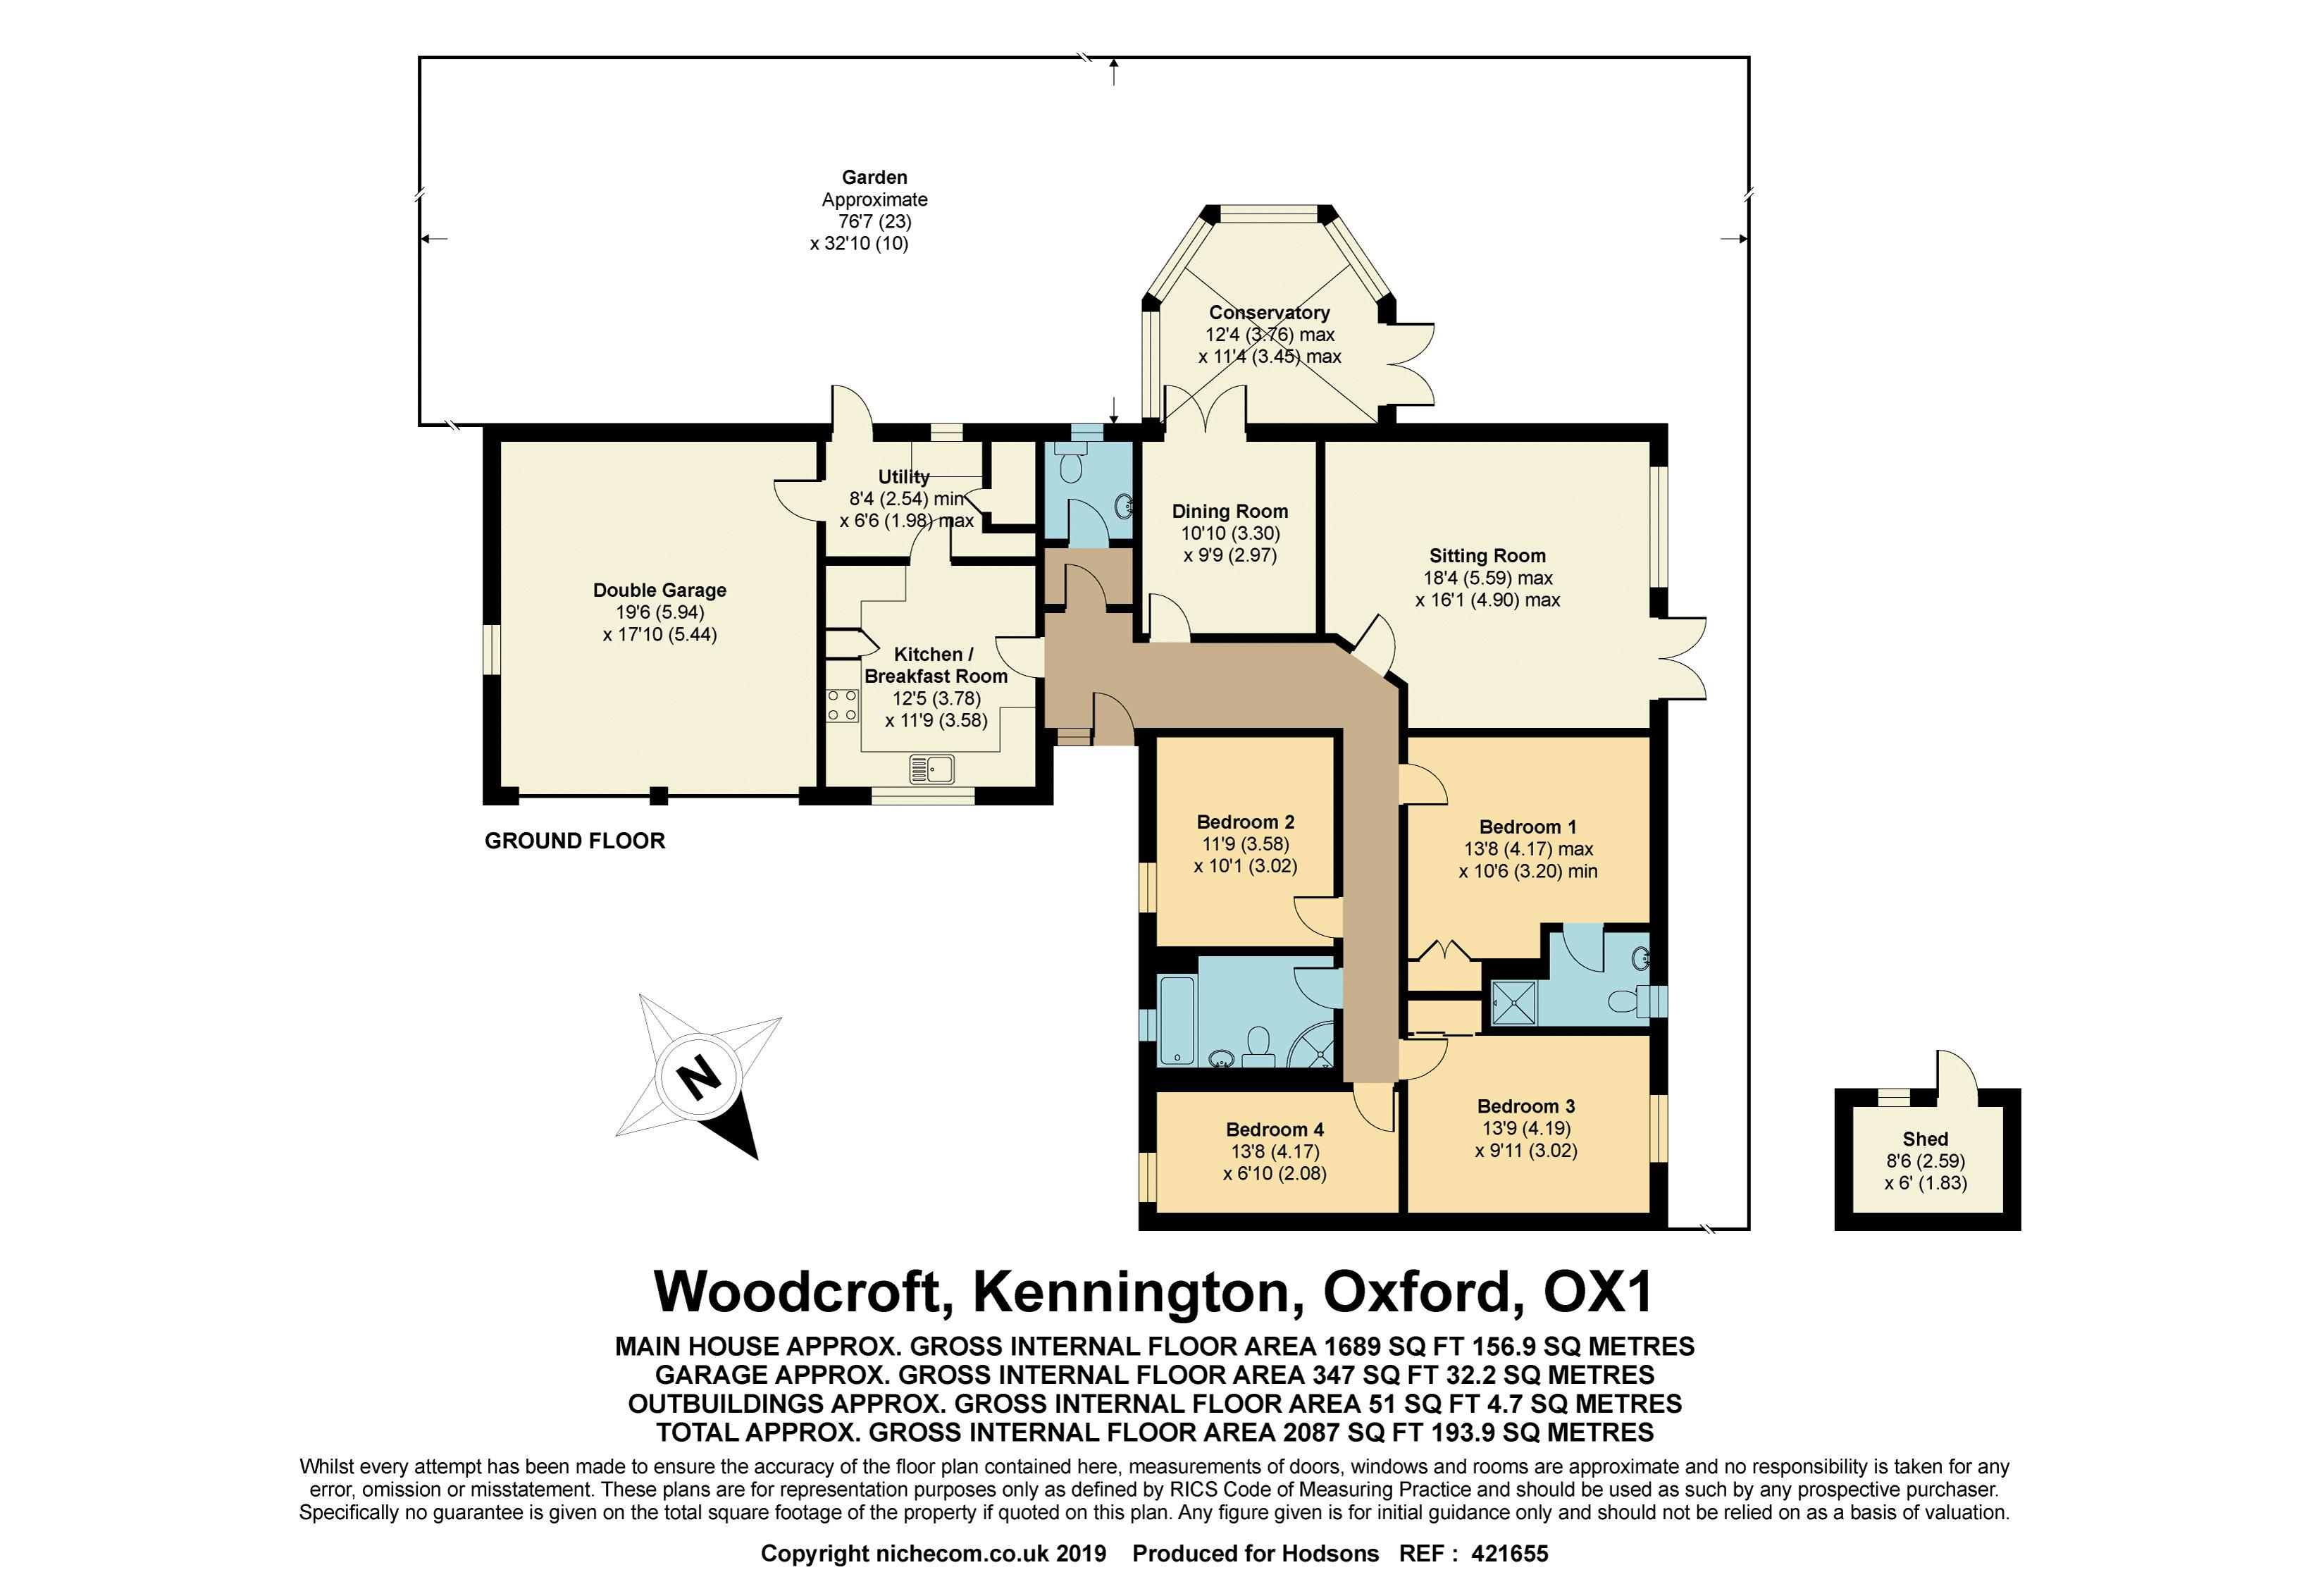 Woodcroft Kennington